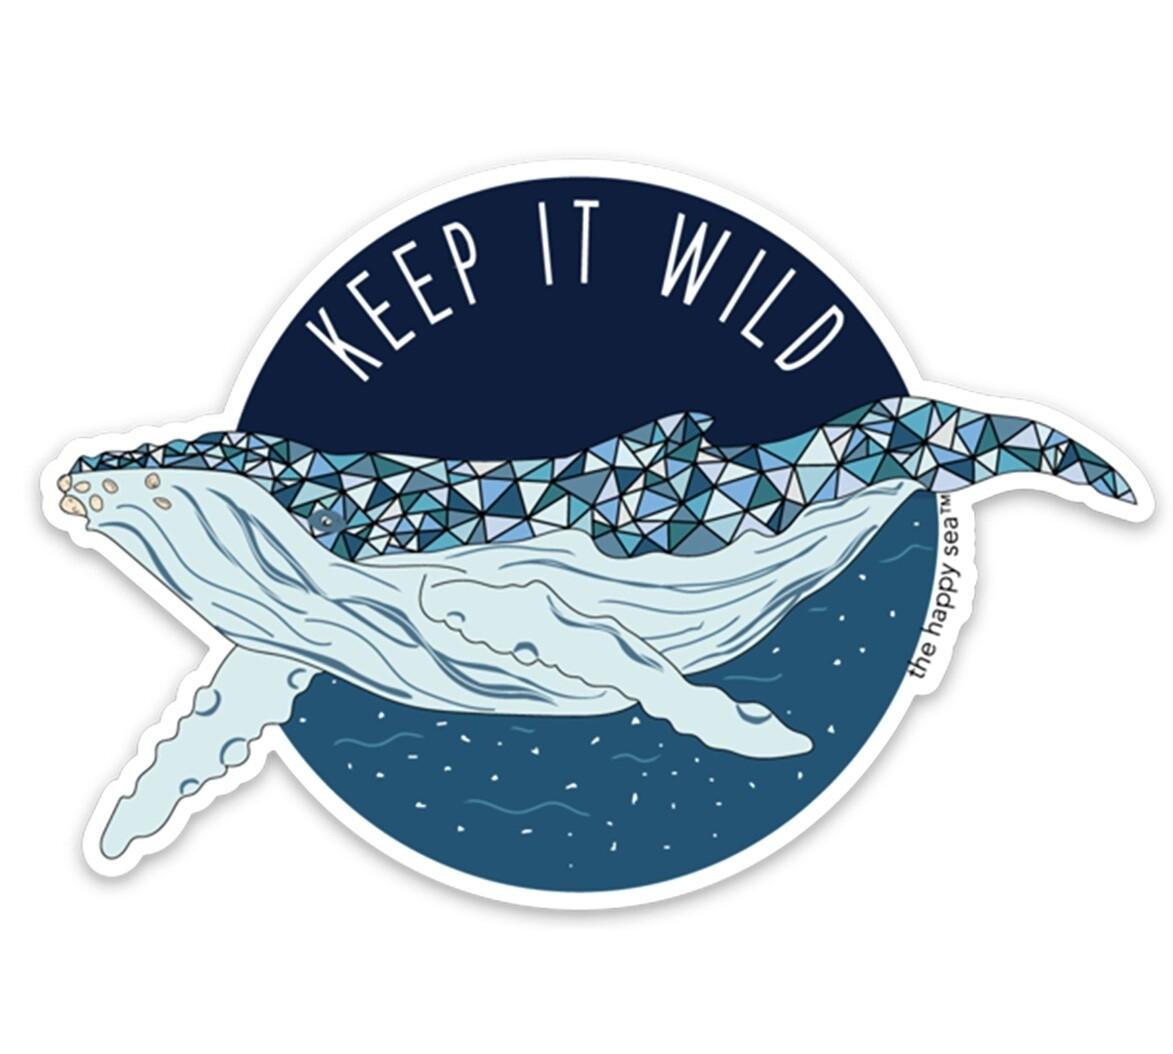 "The Happy Sea 4"" Keep It Wild Sticker"